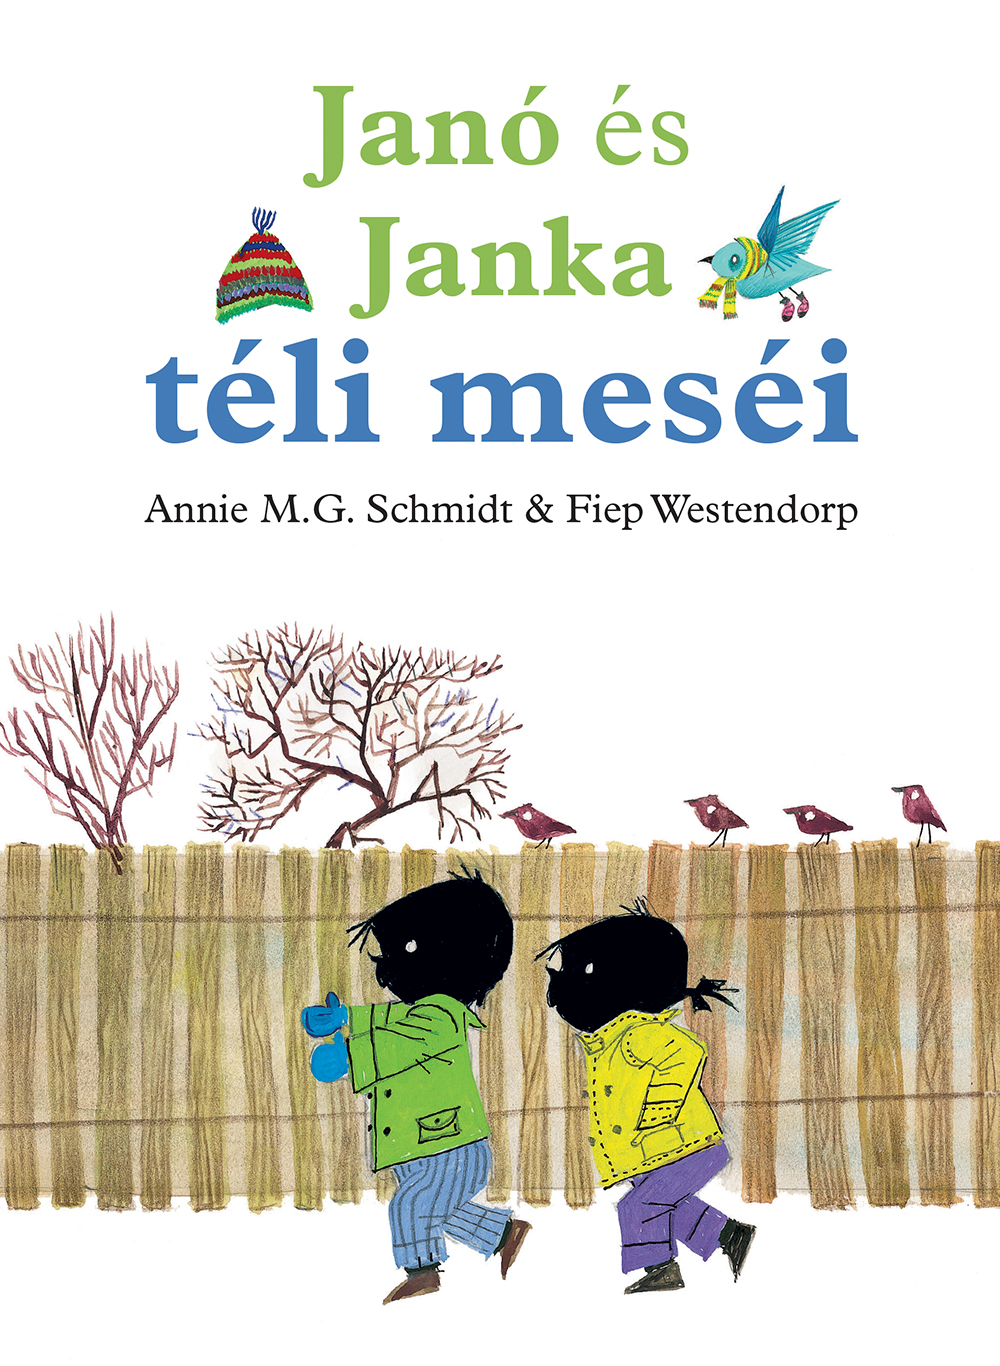 Jano-es-Janka-telen_borito_1000px